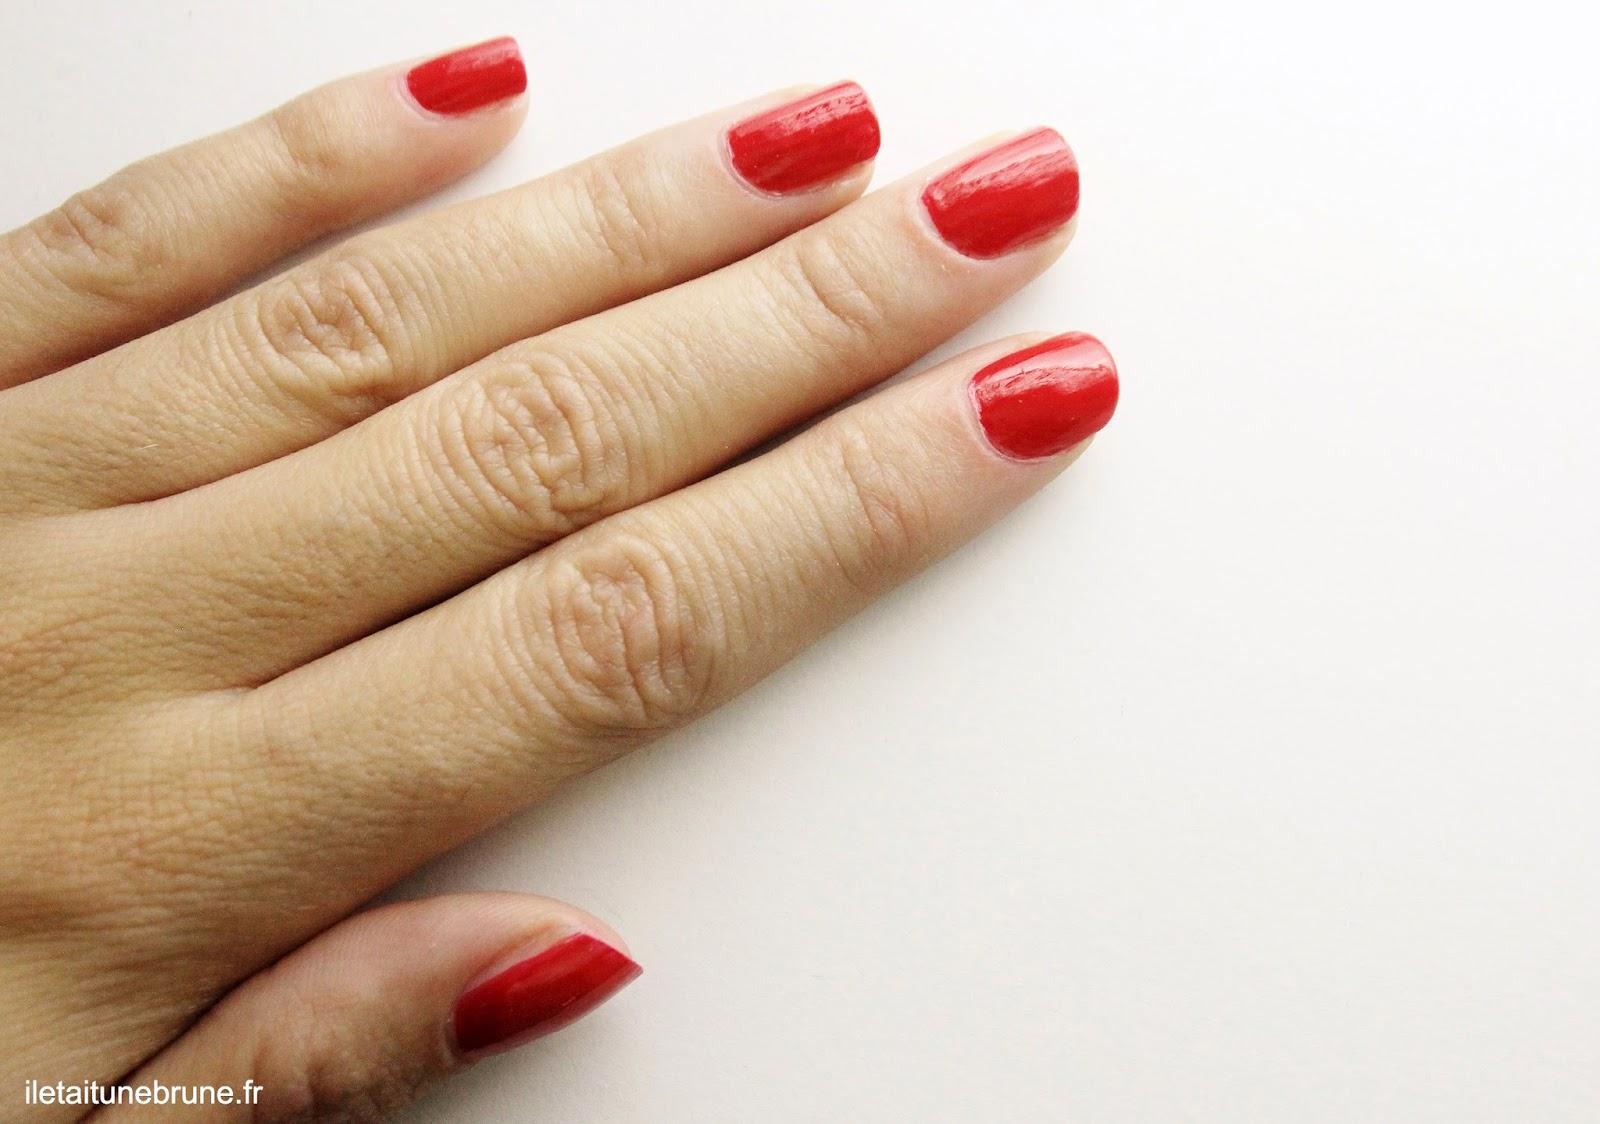 swatch vernis rouge profond beautélive